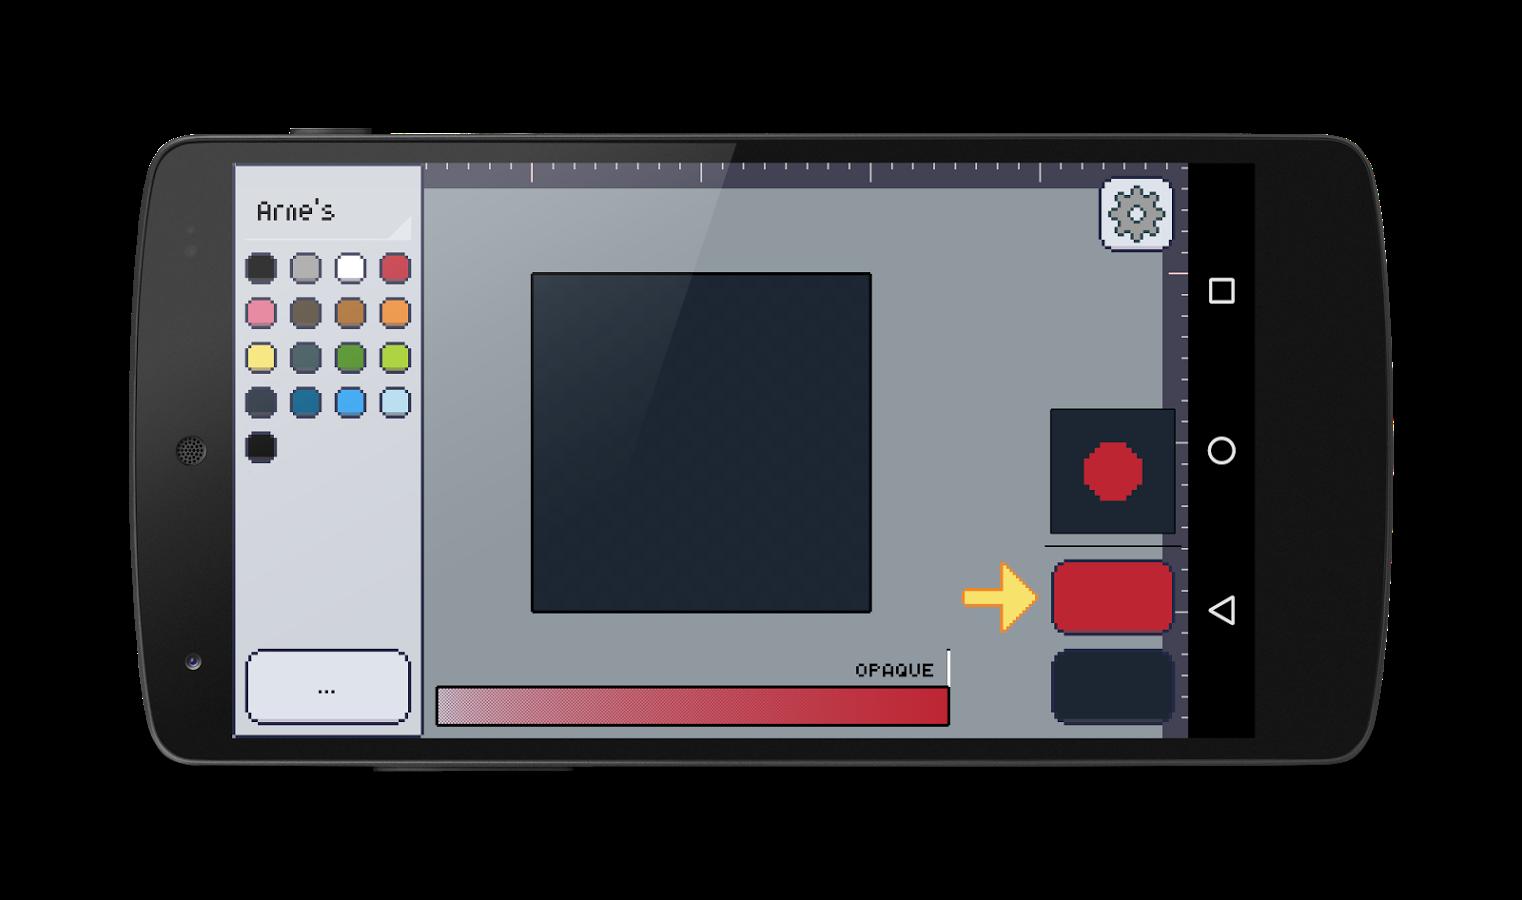 Drawn pixel art 16 bit Pixly Android Pixly screenshot Play